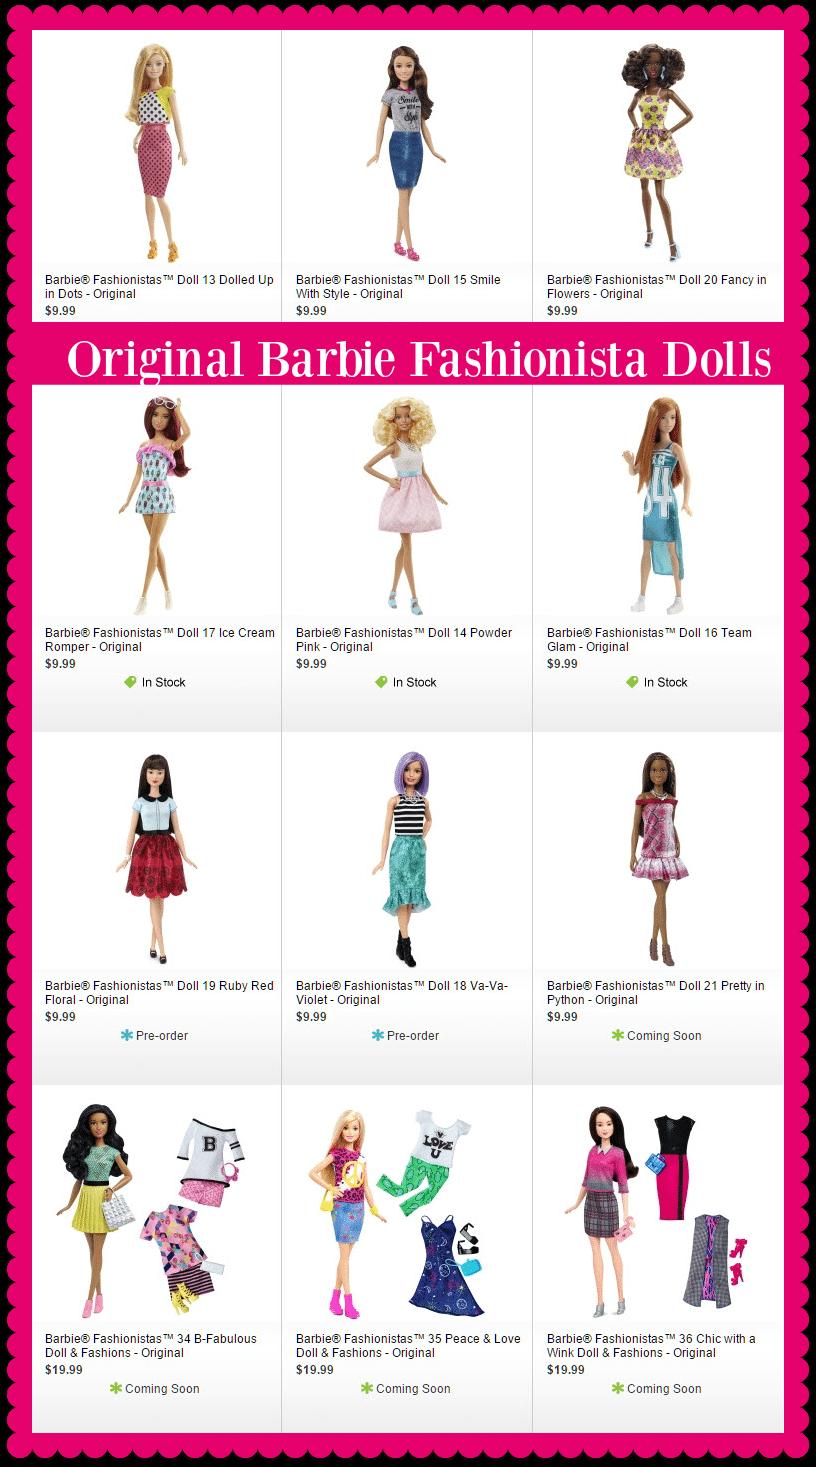 New Barbie Original Fashionistas Dolls